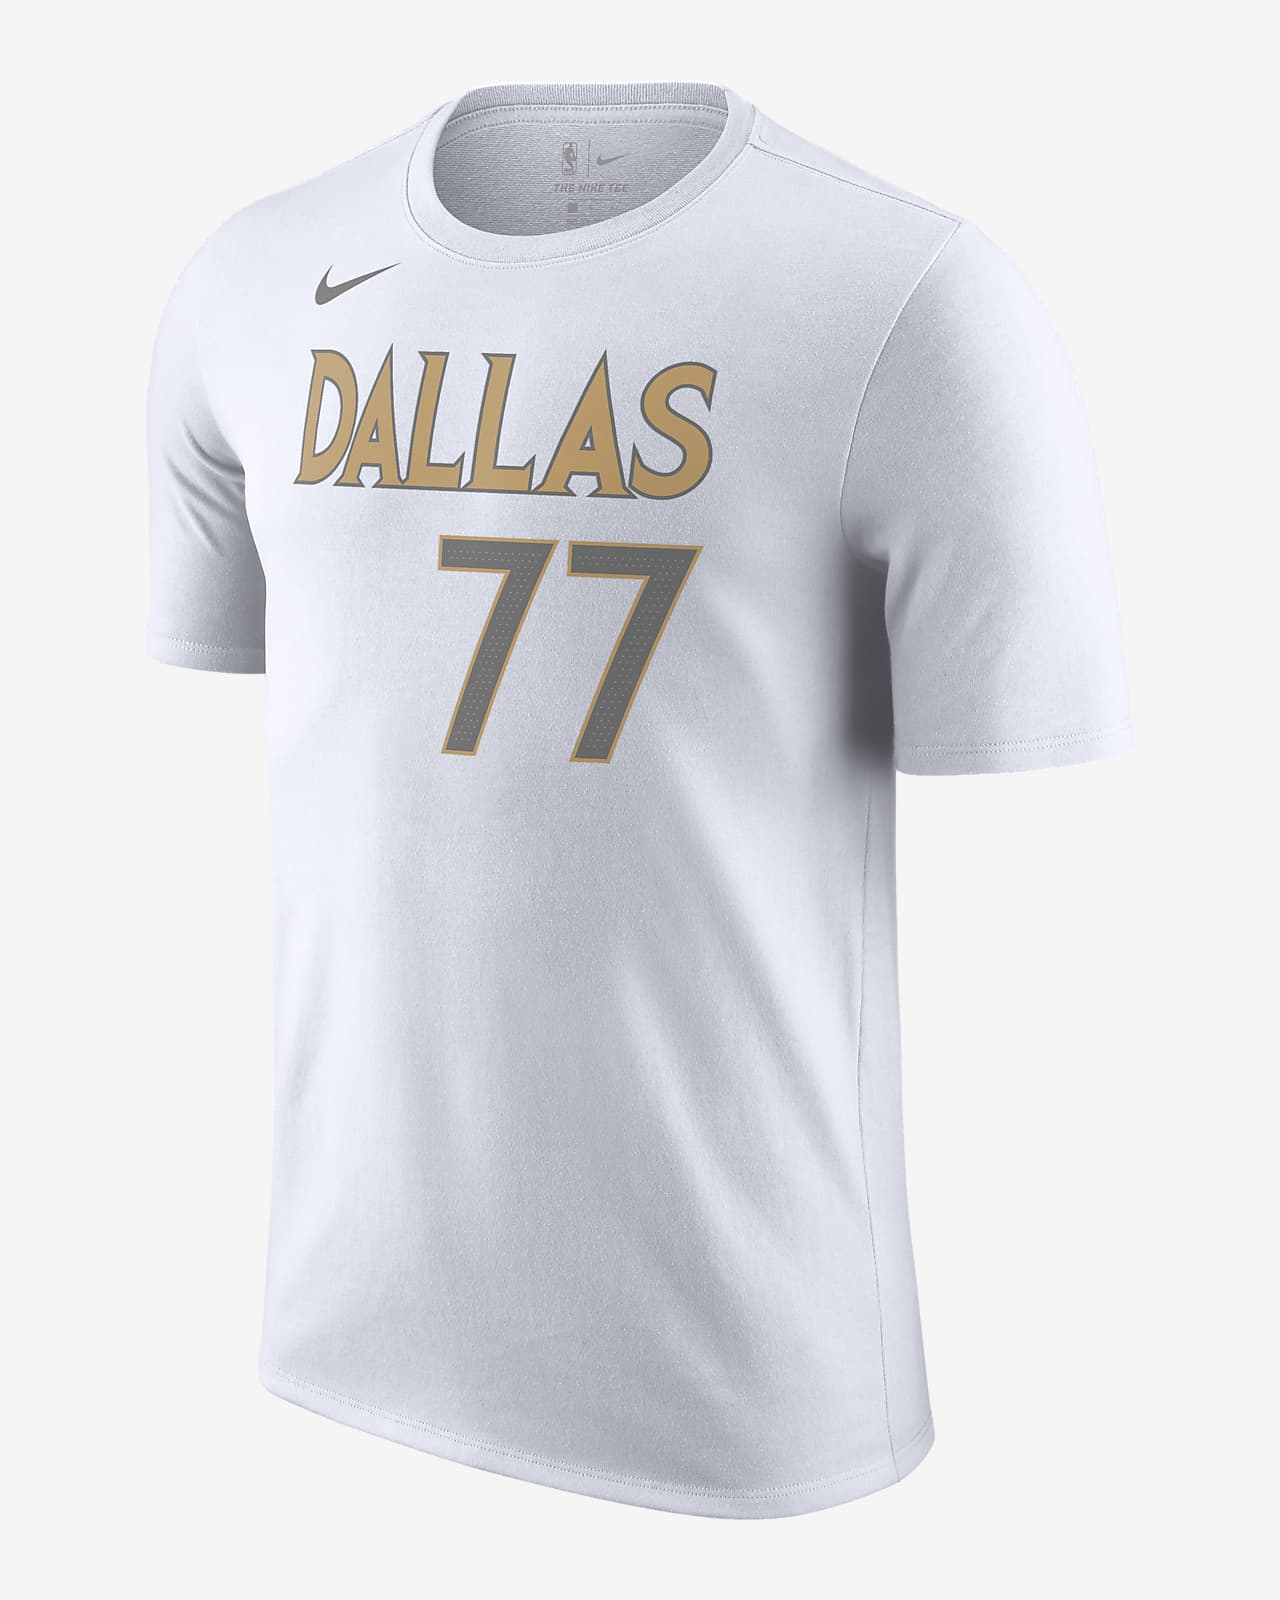 Dallas Mavericks City Edition Nike NBA-herenshirt